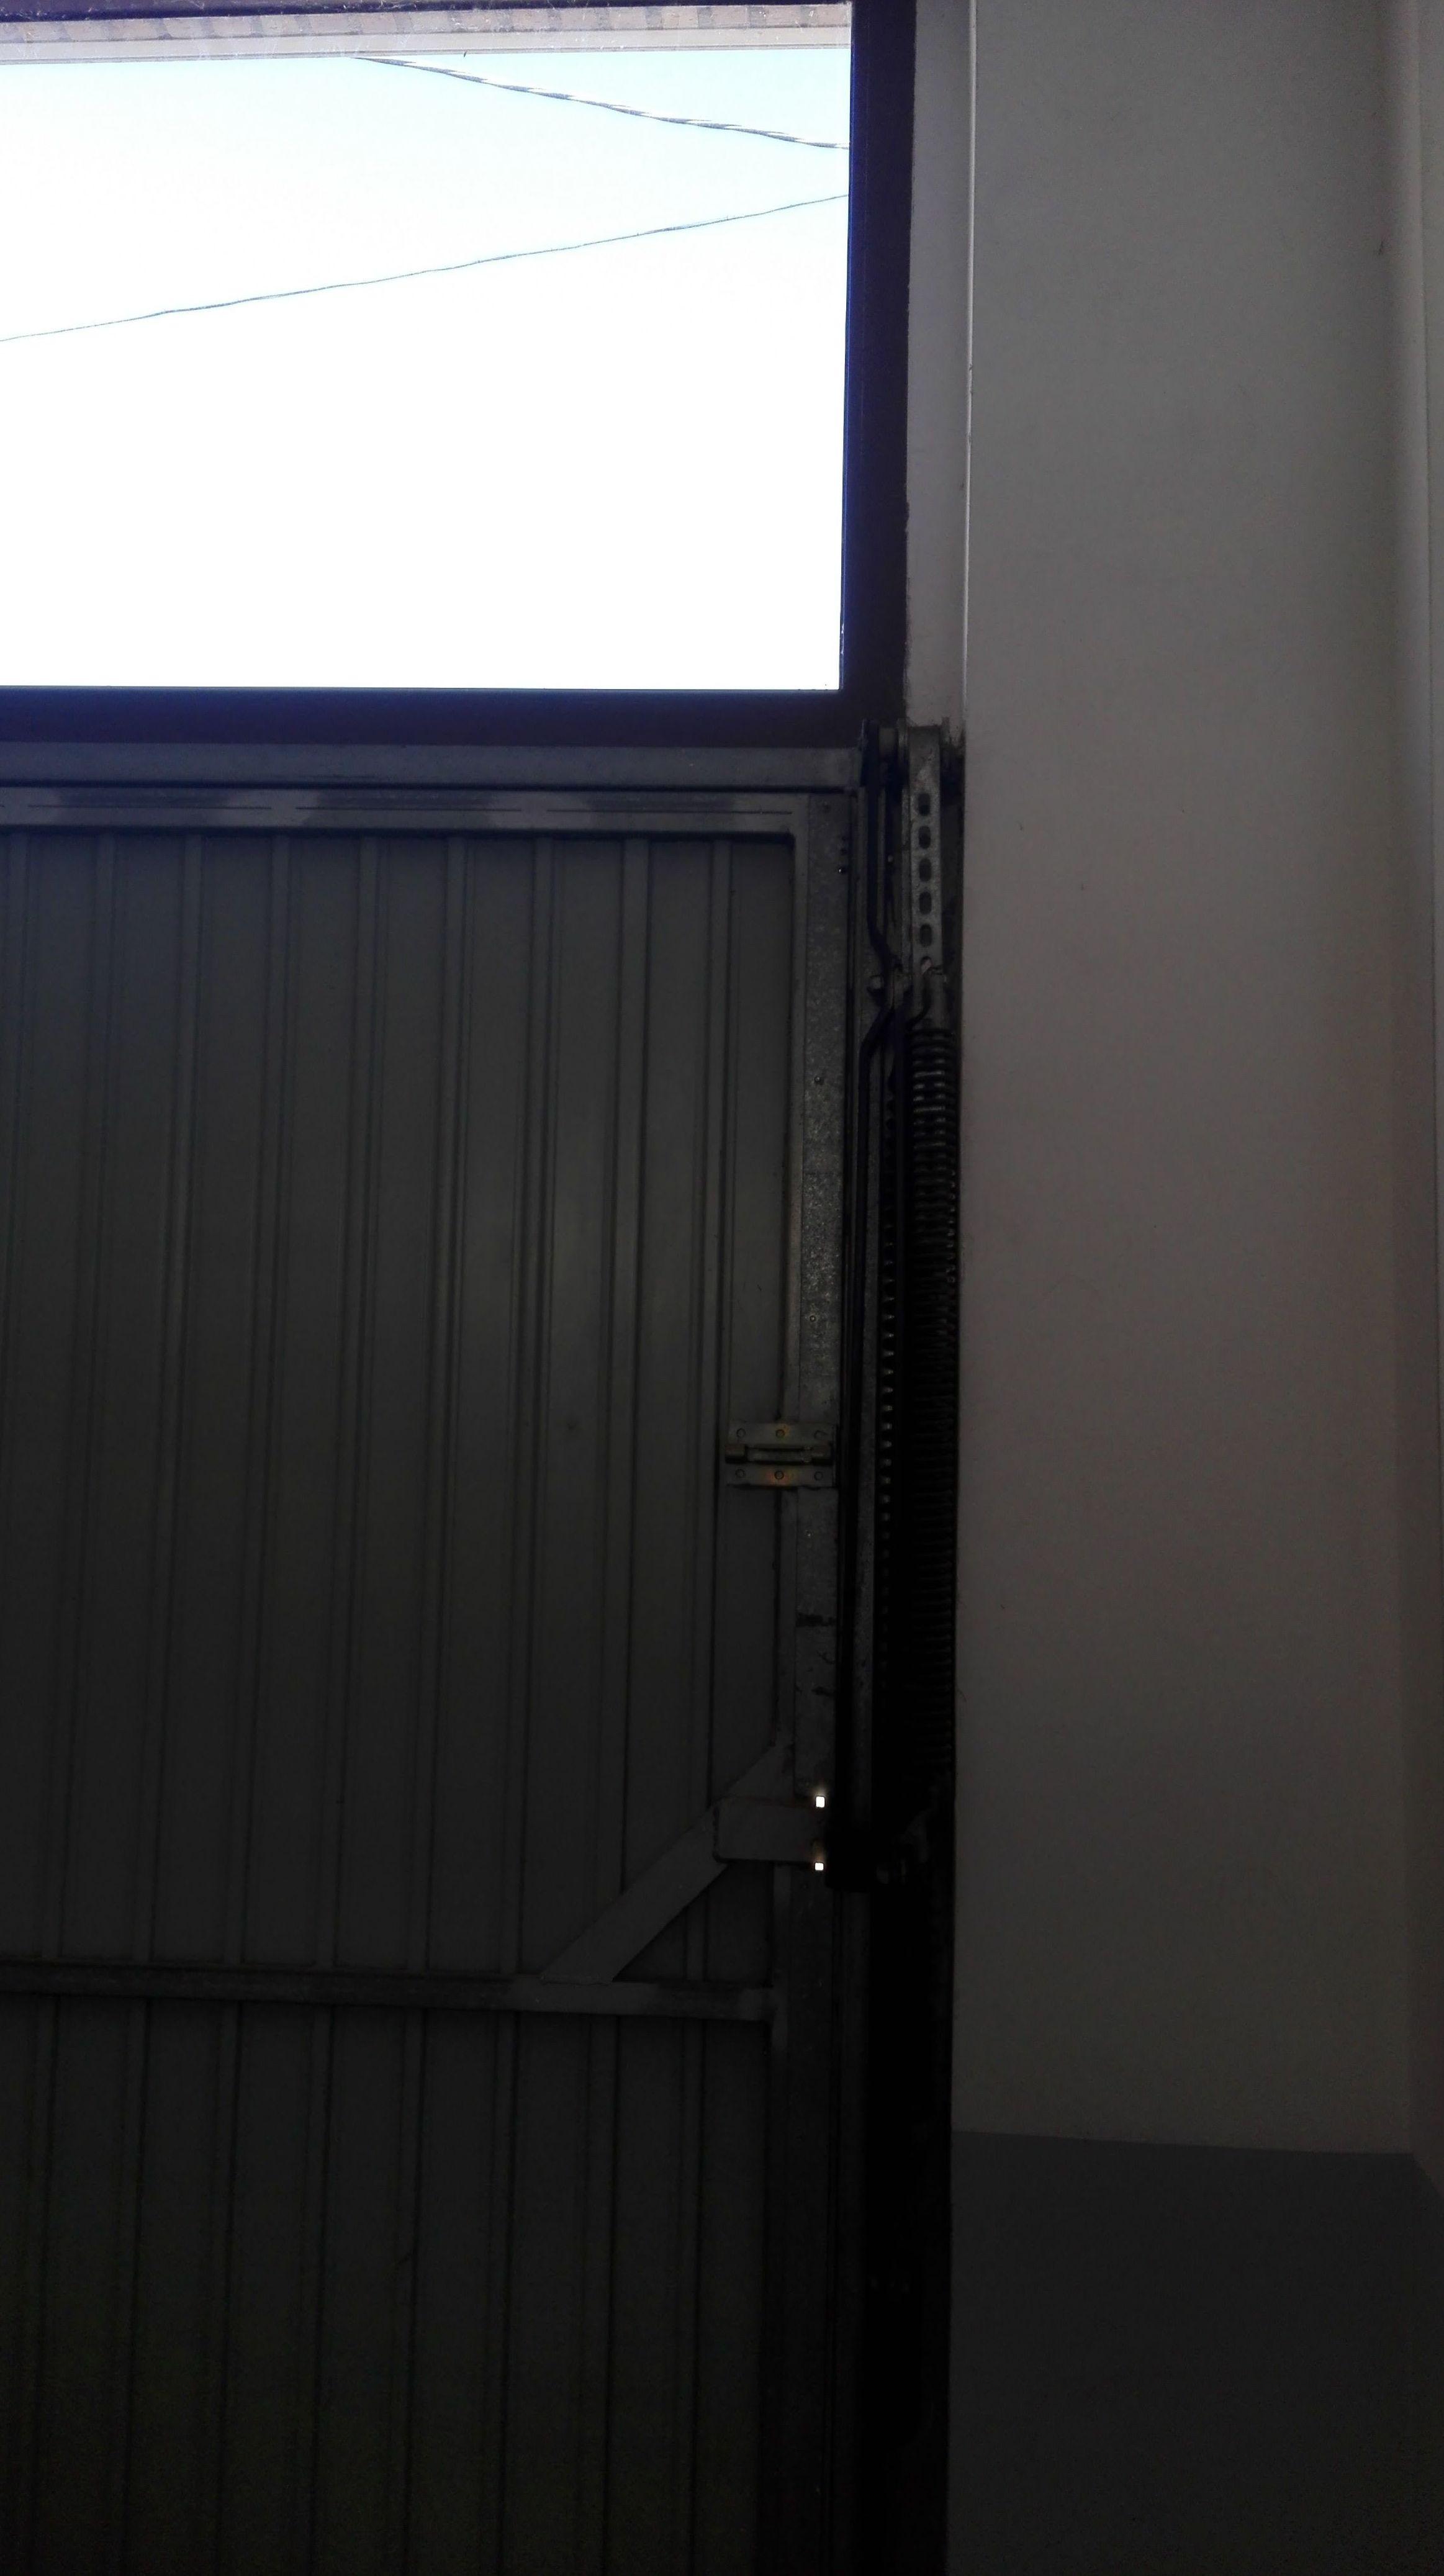 Puerta basculante de muelles no desbordante al exterior